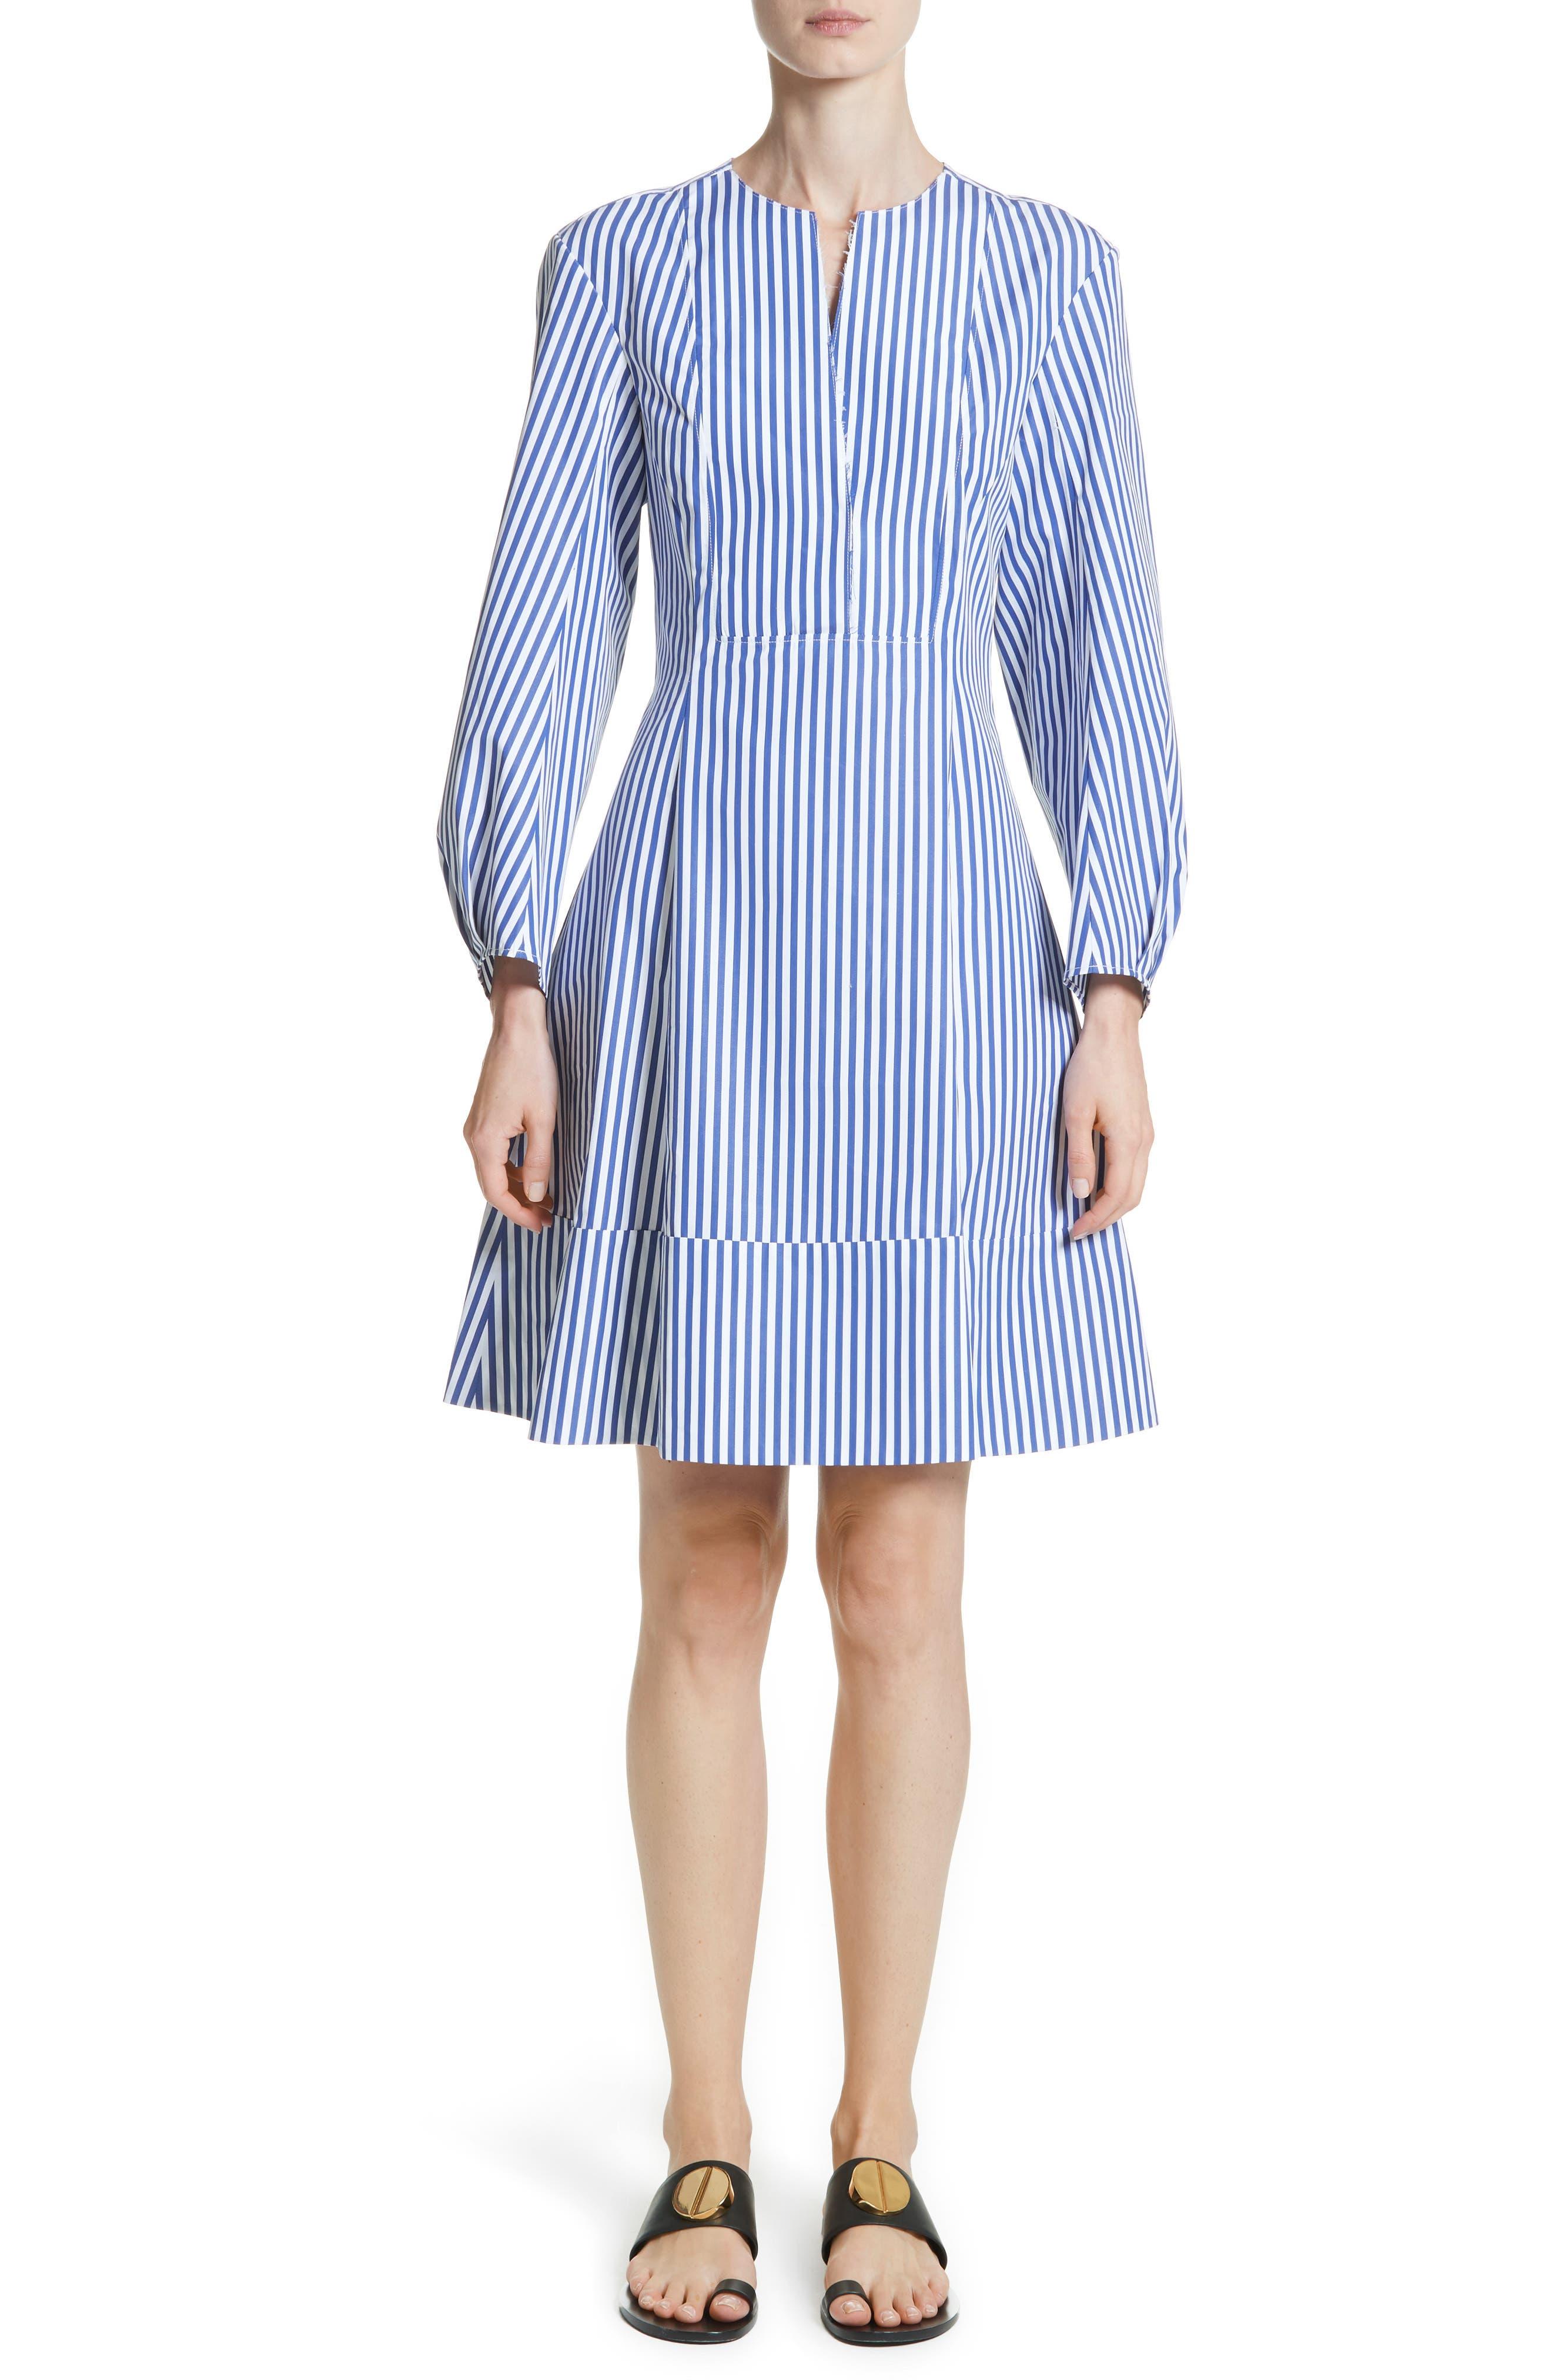 Vanessa Stripe Poplin Minidress,                         Main,                         color, Royal Blue / White Stripe